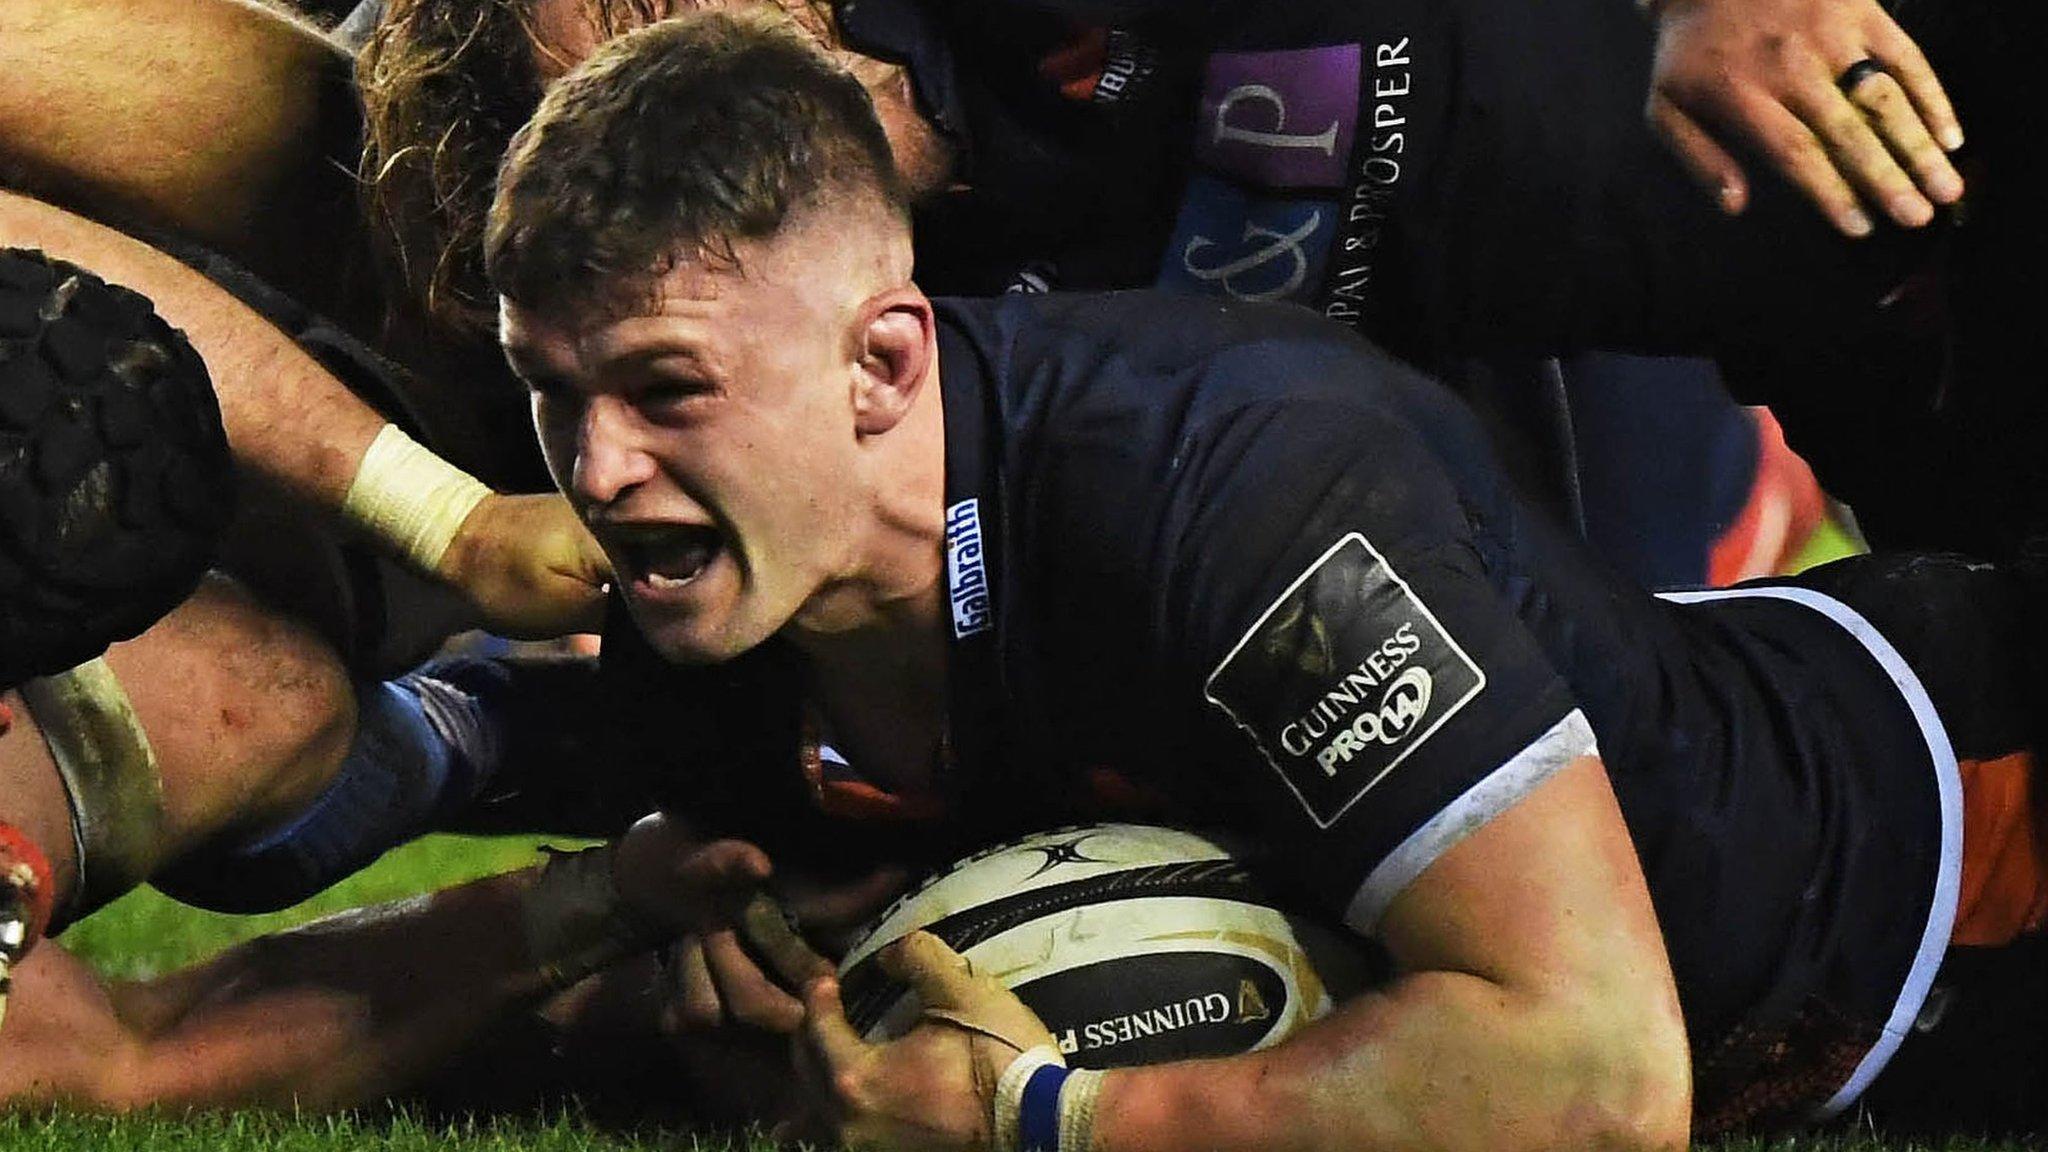 Edinburgh need to 'battle' to reach play-offs - Cockerill